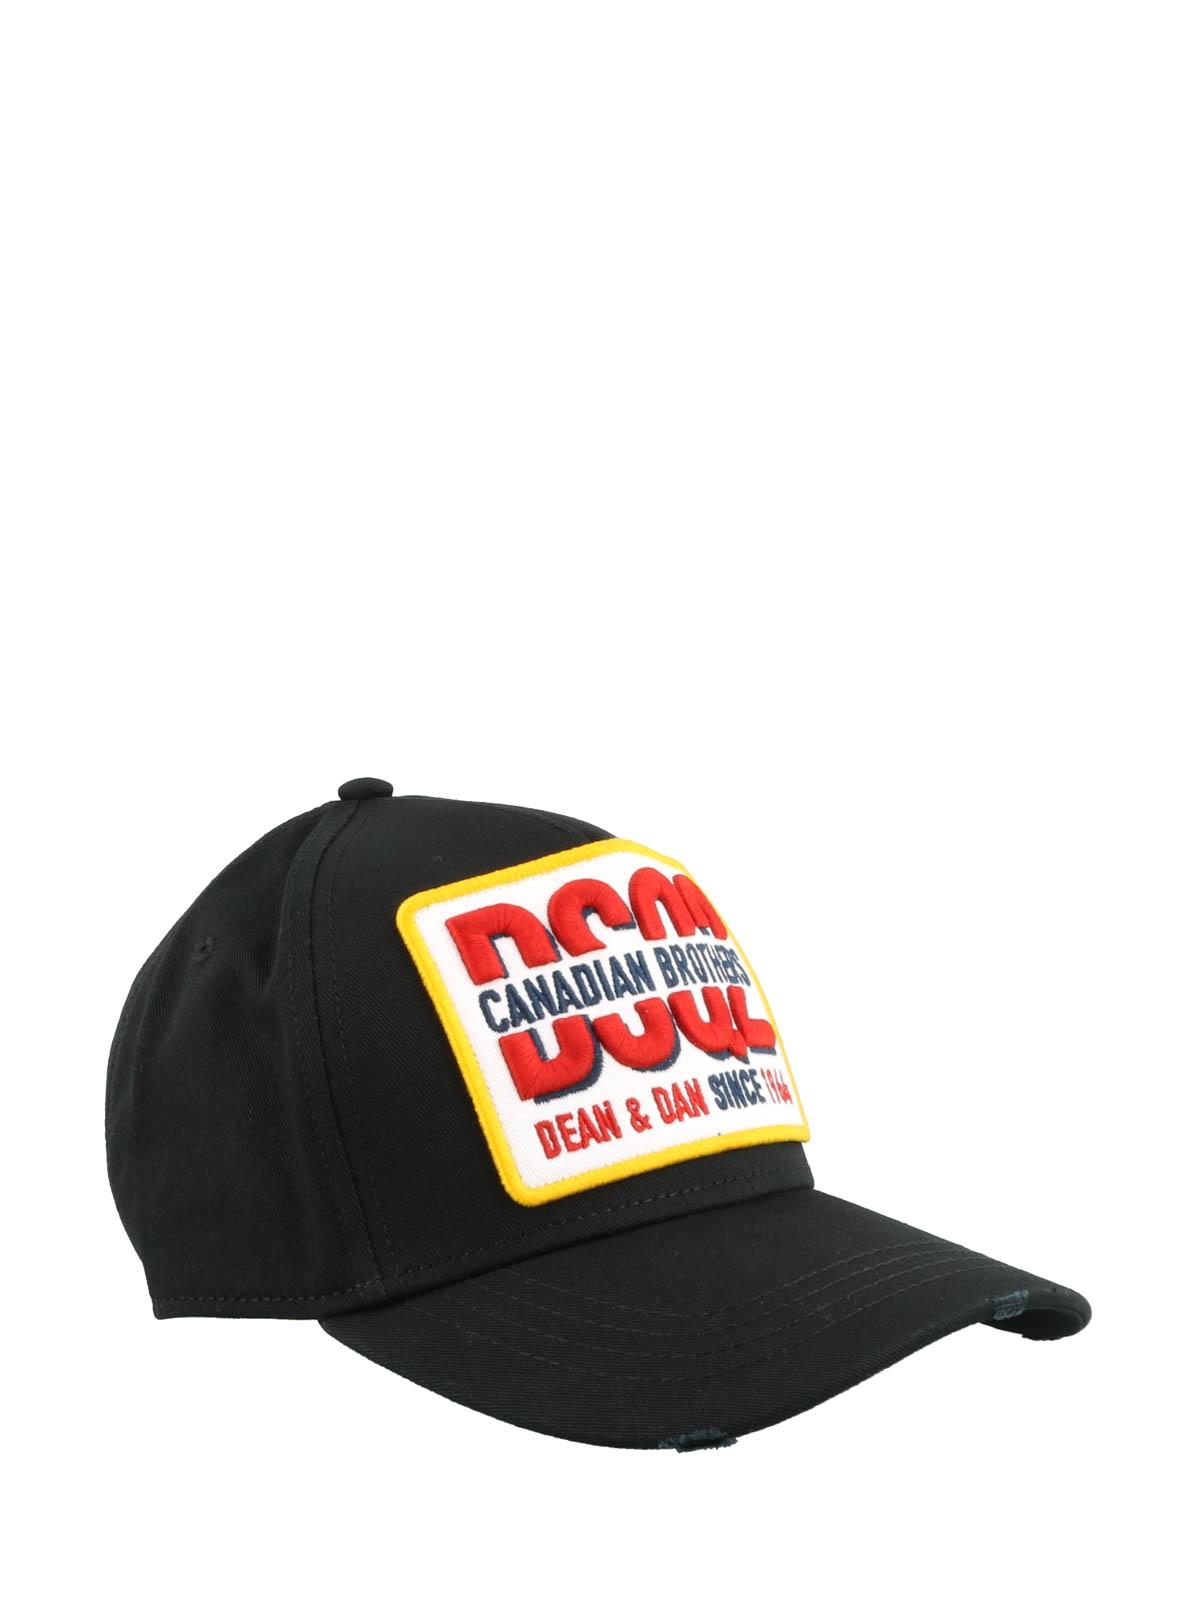 8fbd83a0b2b1a Dsquared2 - Canadian Brothers black baseball cap - hats   caps ...